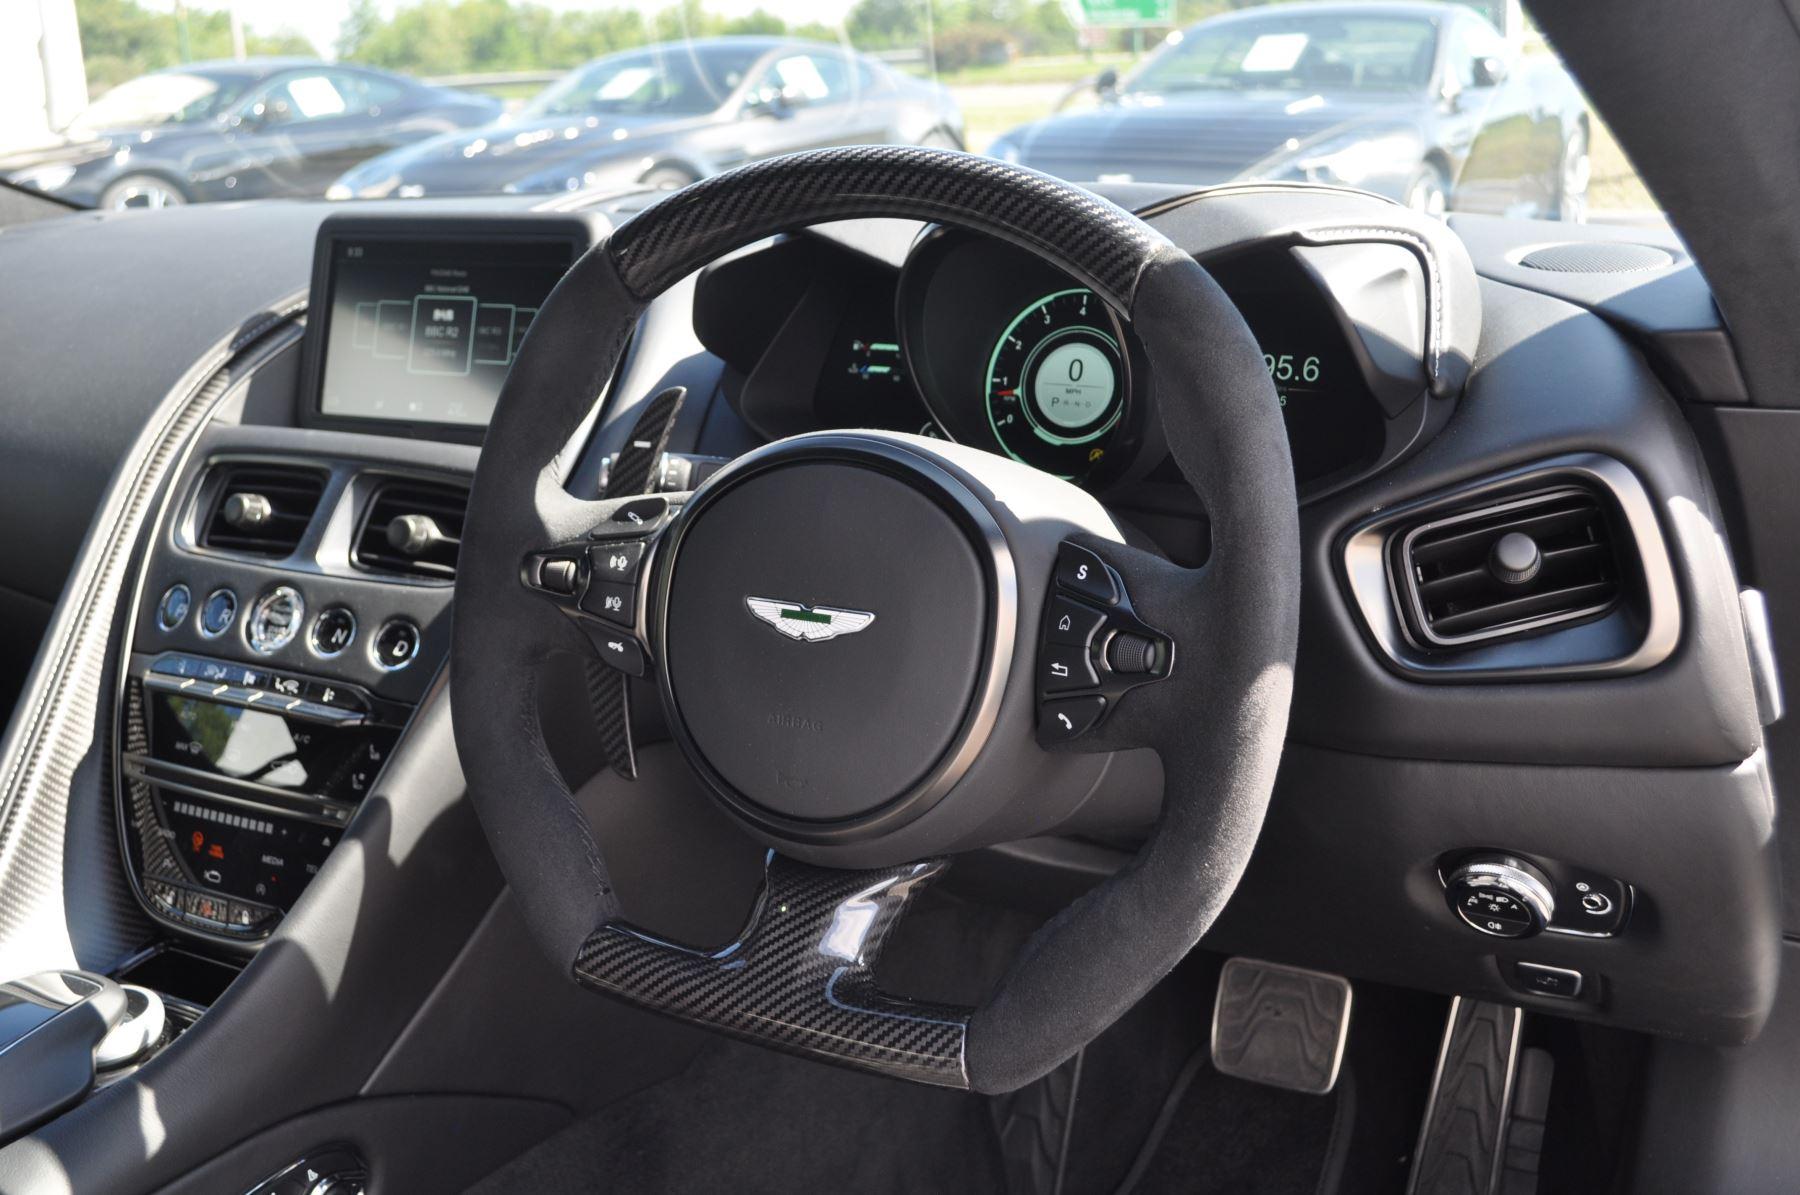 Aston Martin DBS V12 Superleggera 2dr Touchtronic image 20